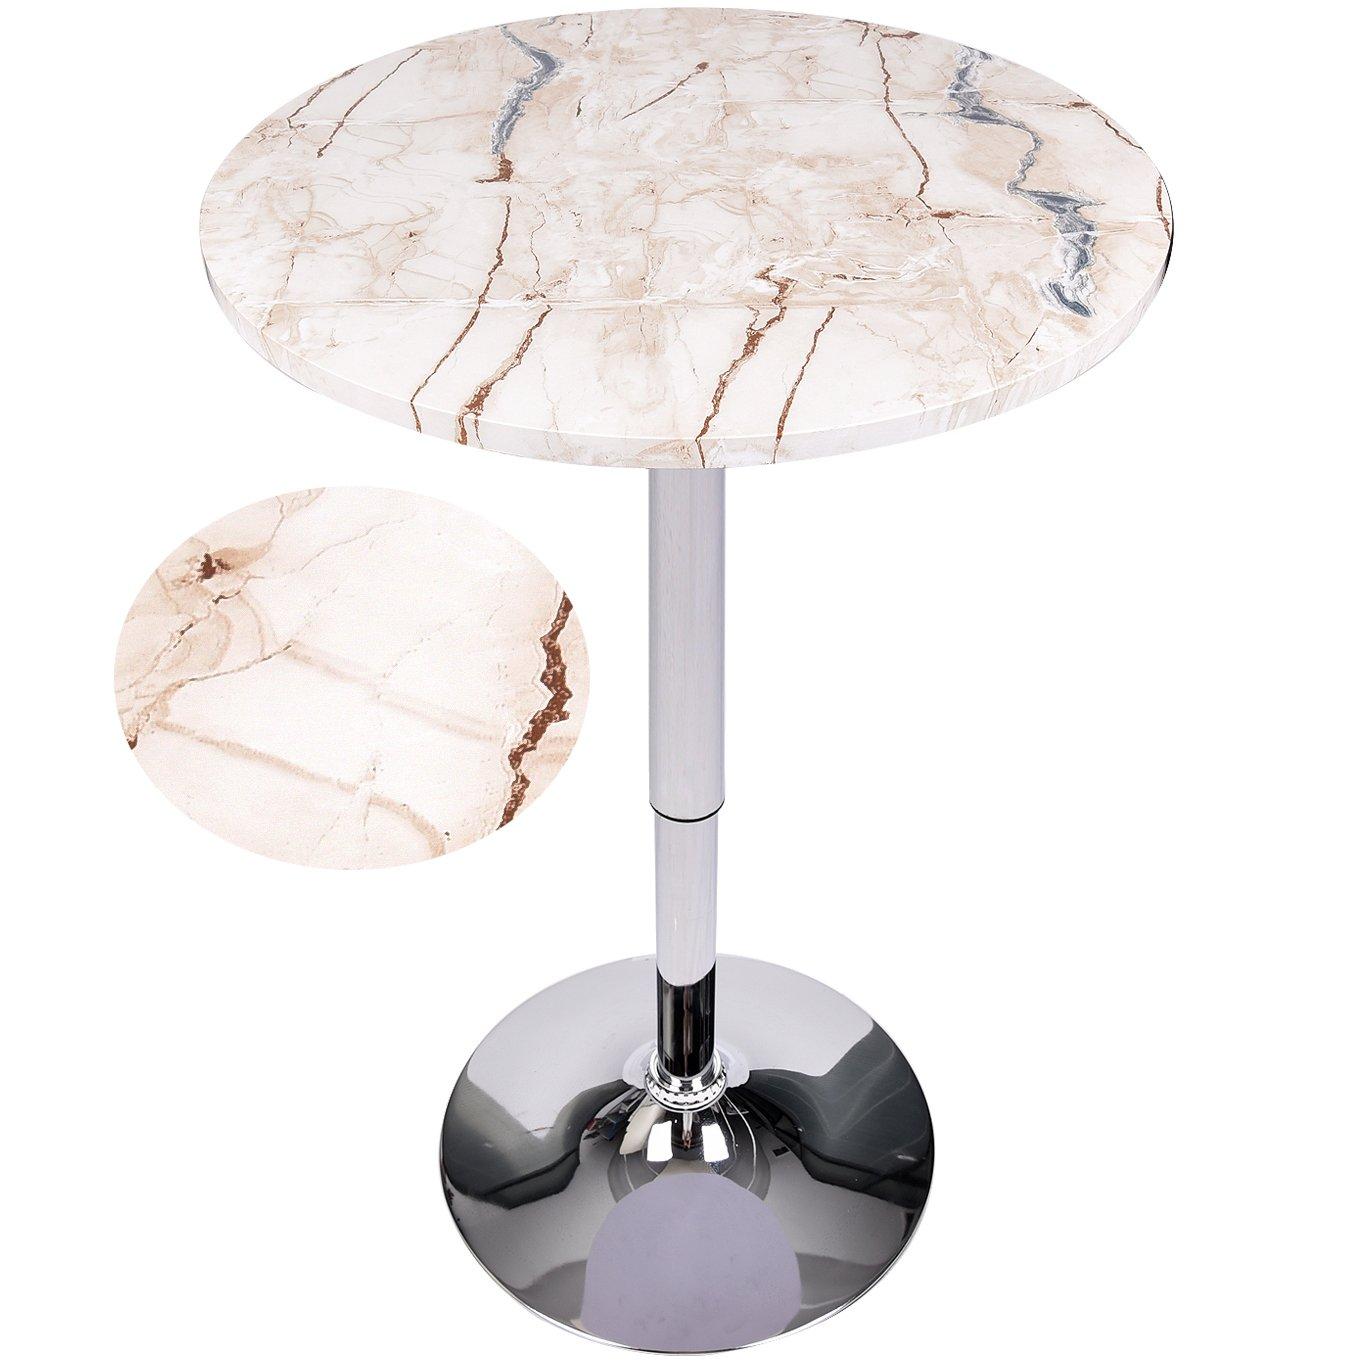 Elecwish Modern Round Bar Table Adjustable Bistro Pub Counter Wood Top Swivel Indoor (Marble)